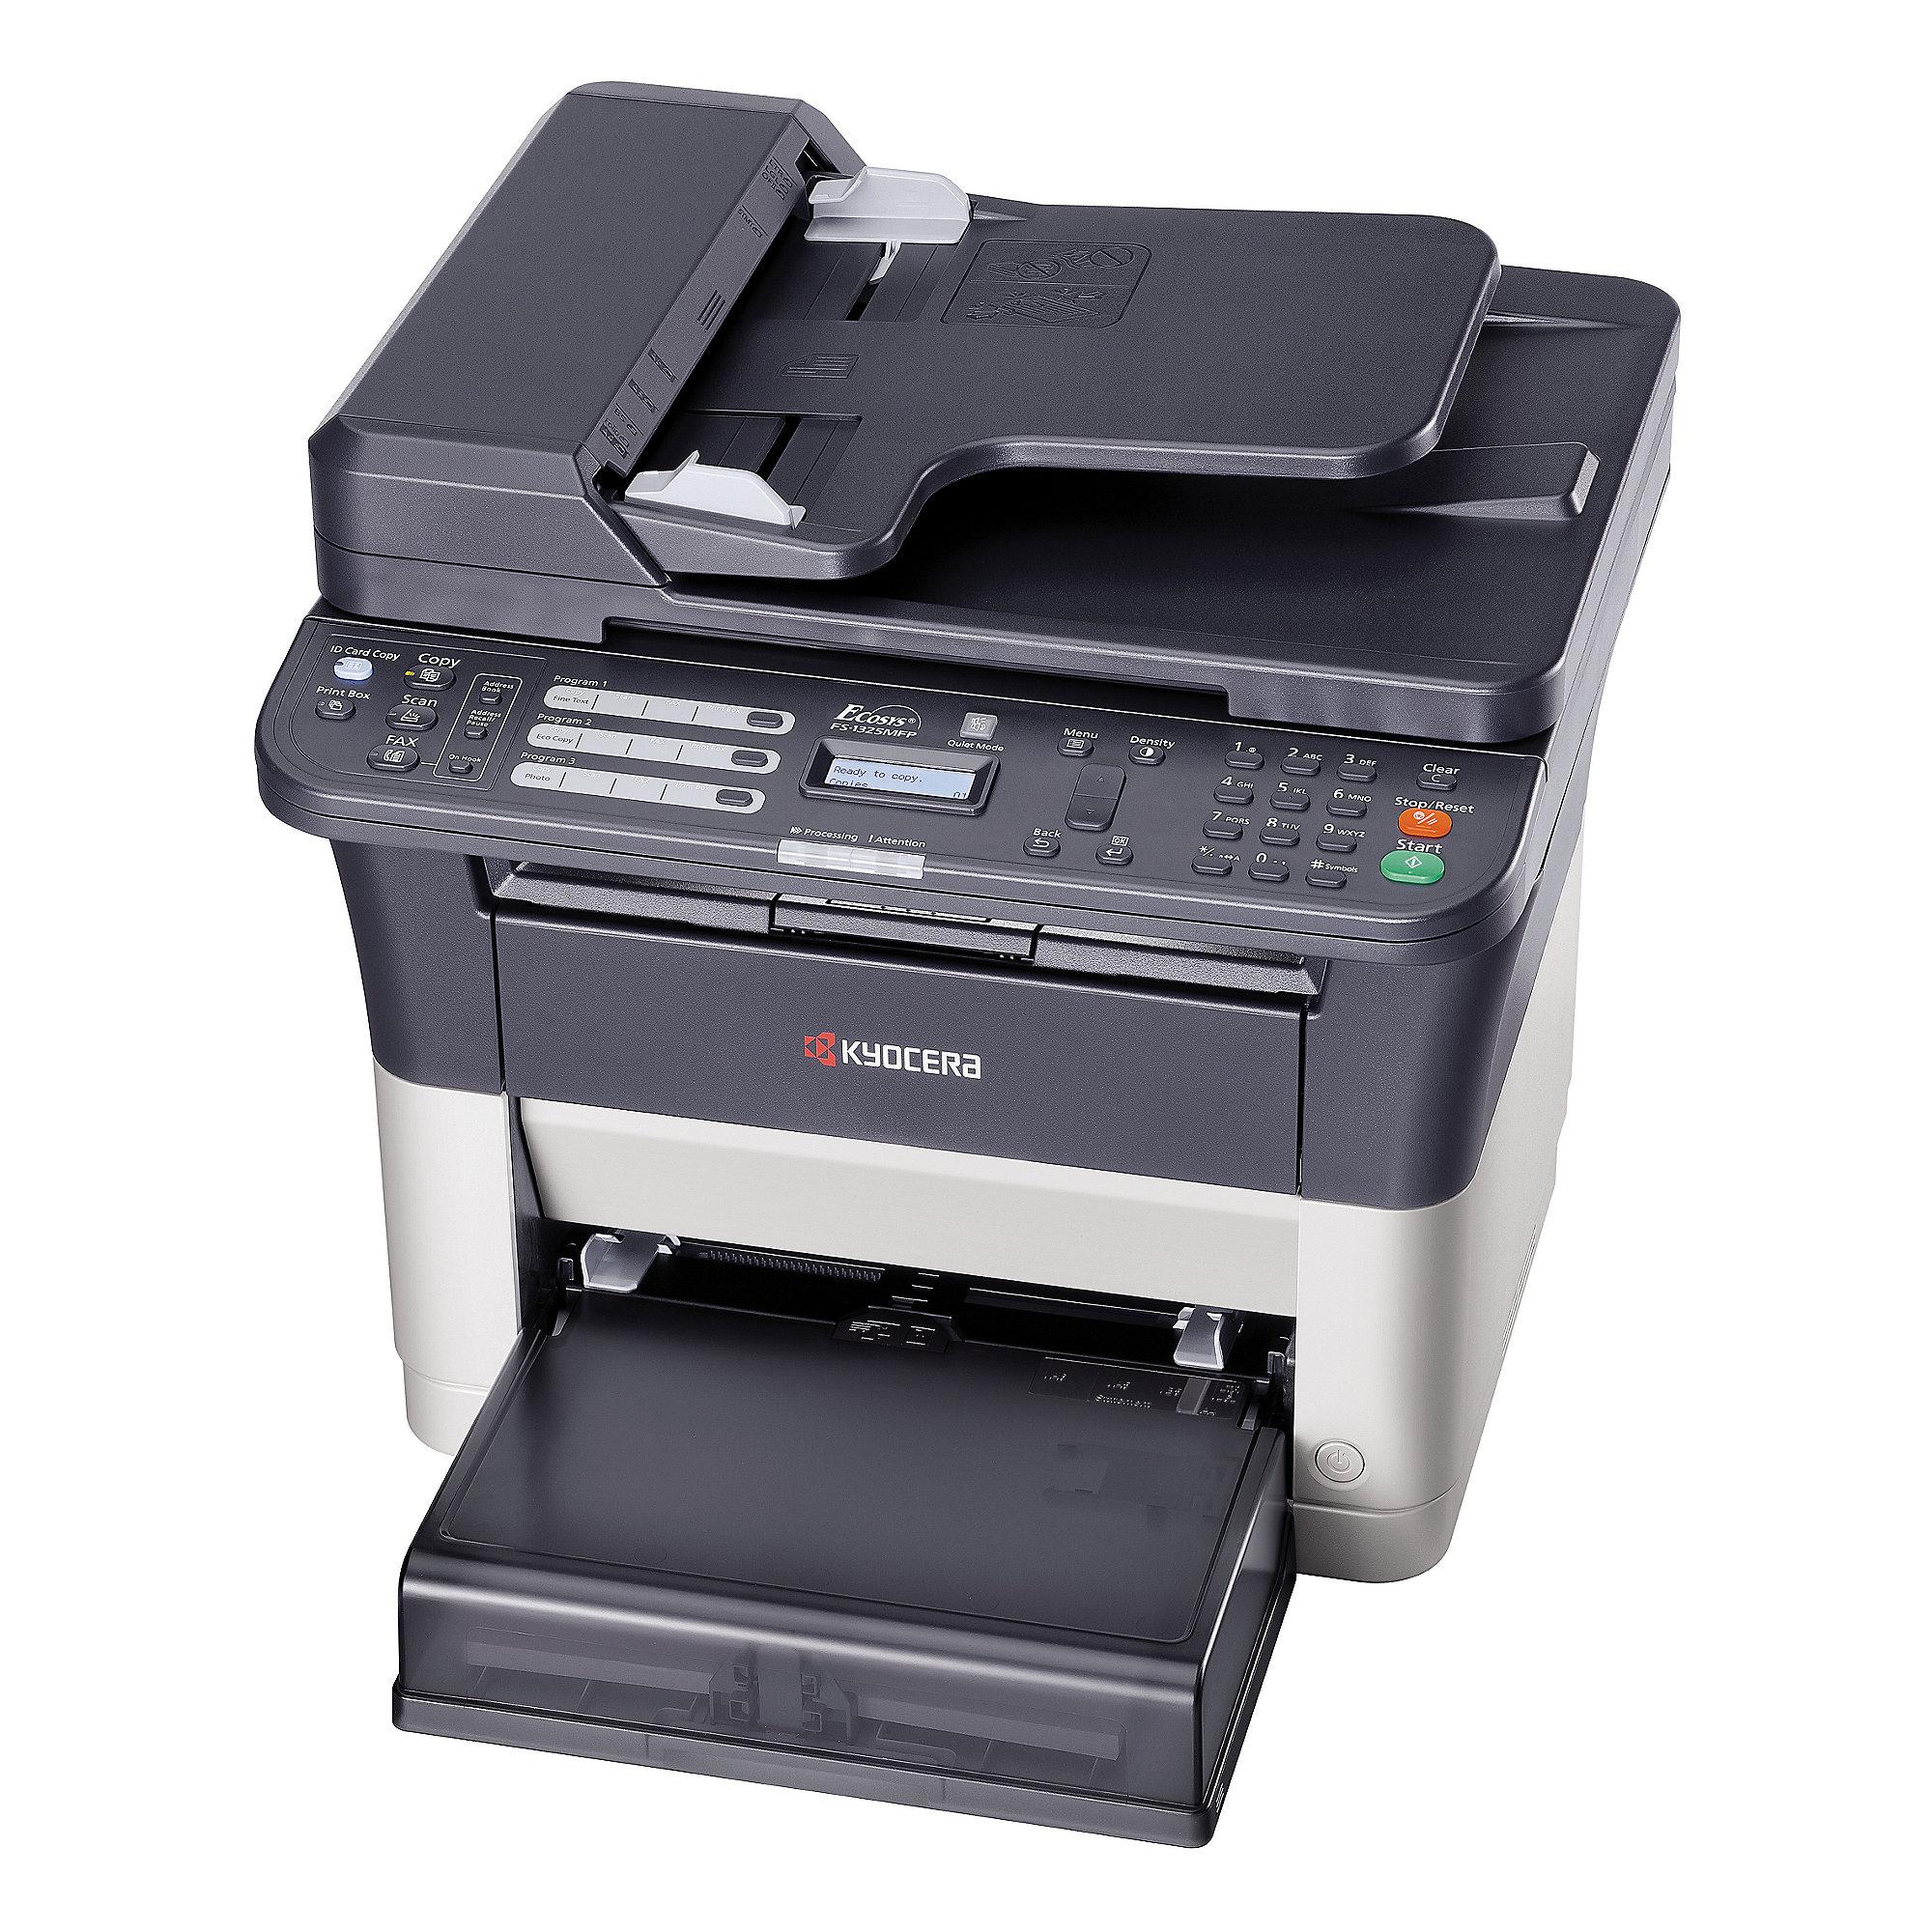 kyocera fs 1325mfp s w laserdrucker scanner kopierer fax lan 3 jahre garantie cyberport. Black Bedroom Furniture Sets. Home Design Ideas